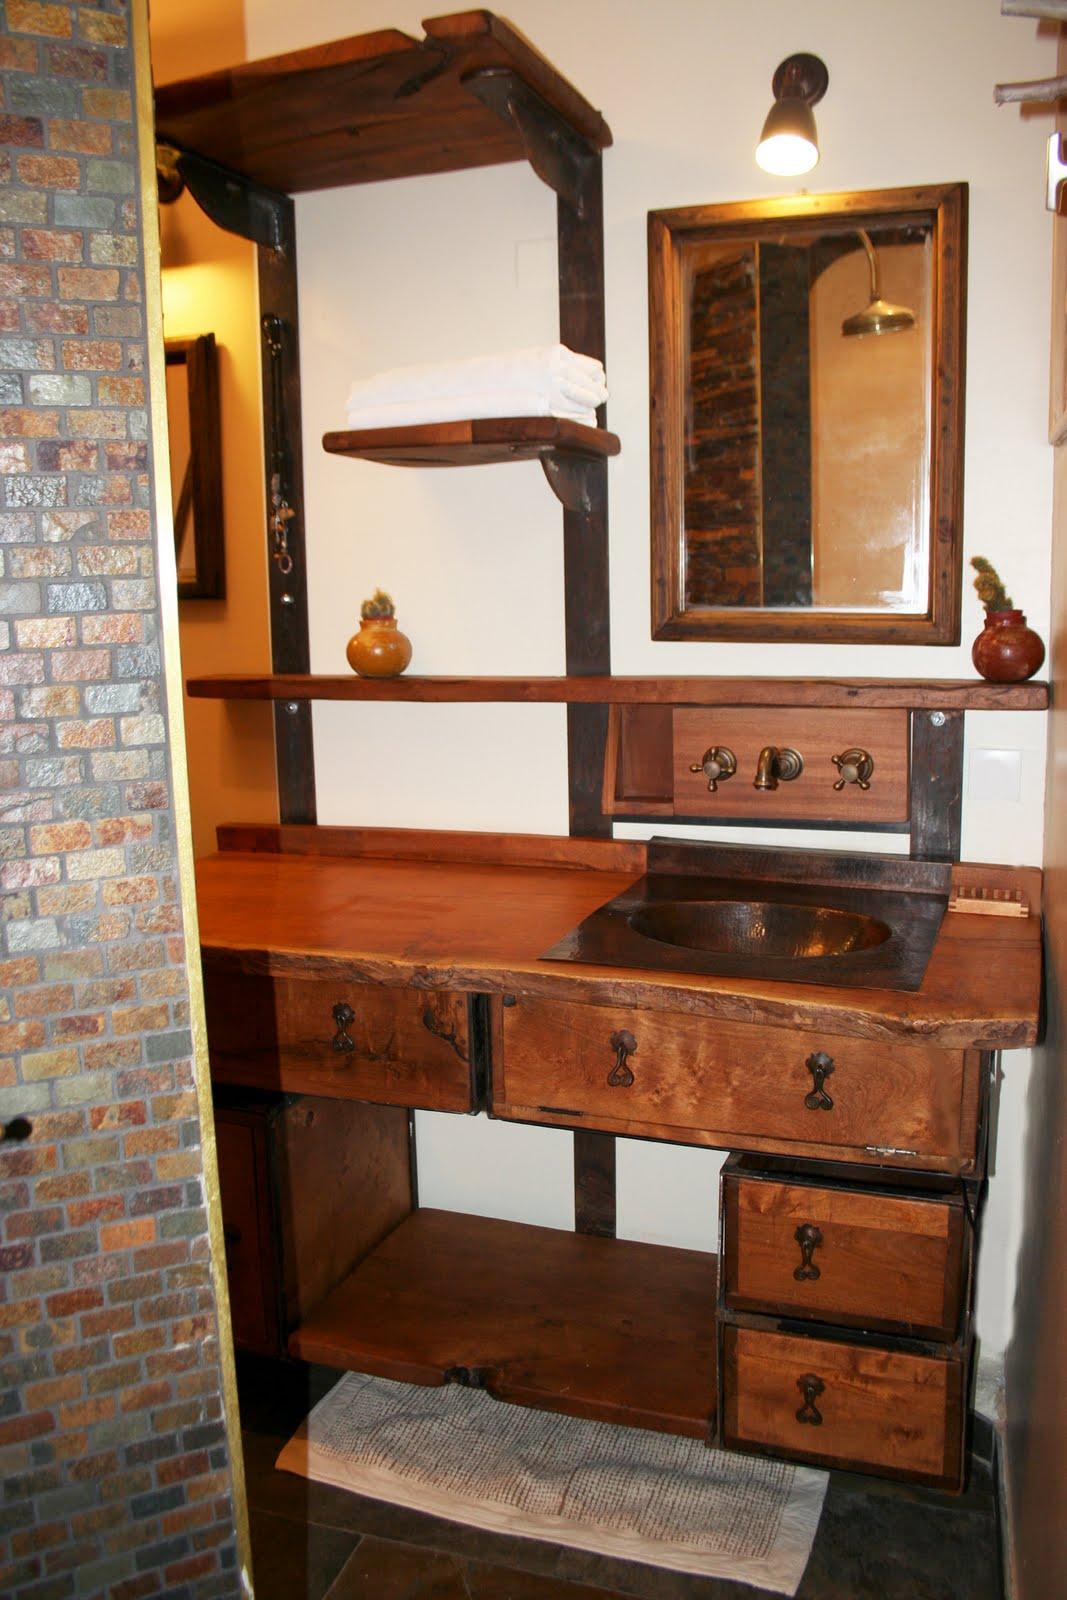 meuble salle de bain teck alinea free meuble salle de bain bois exotique meuble salle de bain. Black Bedroom Furniture Sets. Home Design Ideas